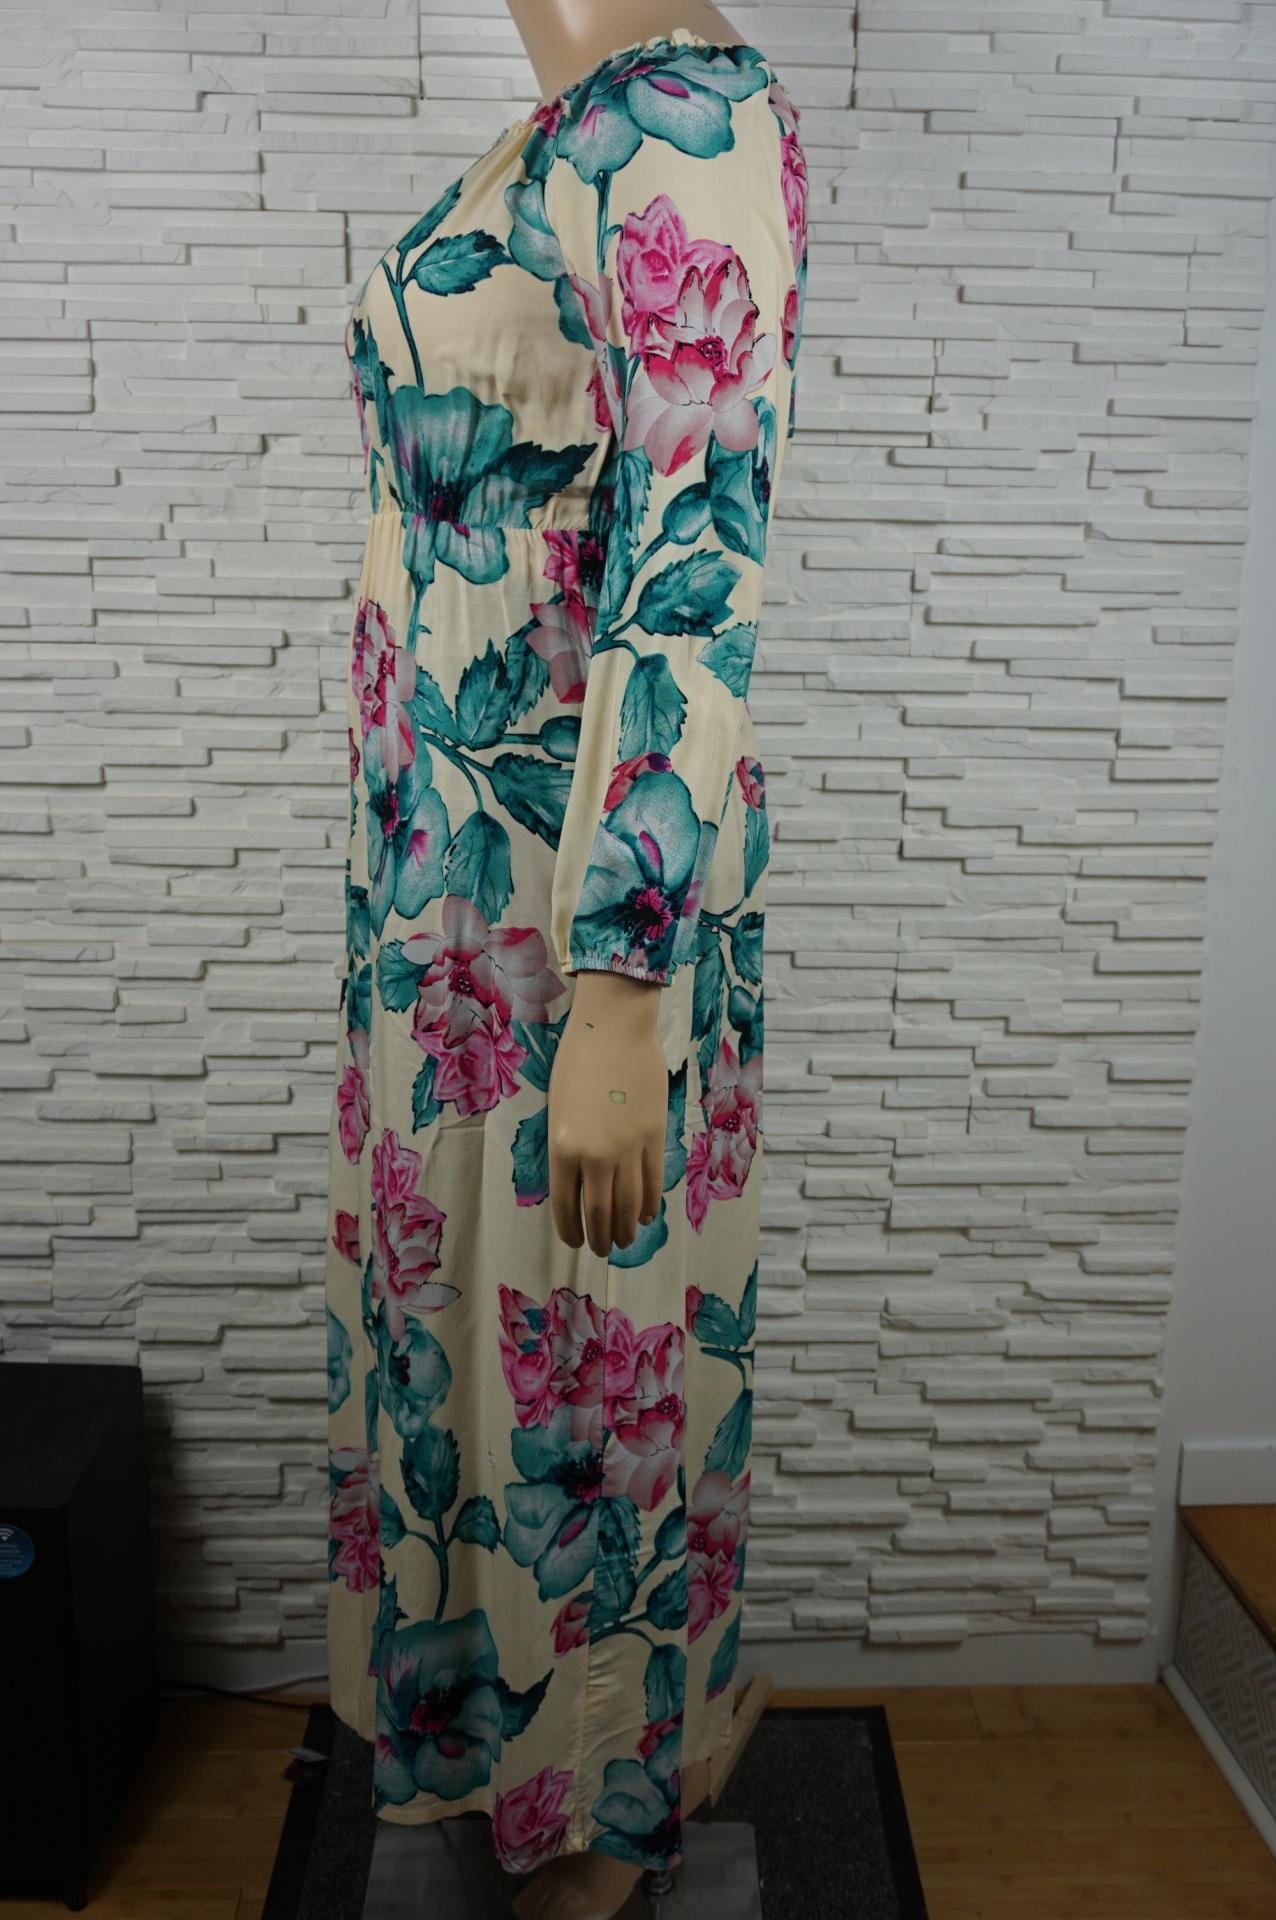 Robe longue a fleurs2